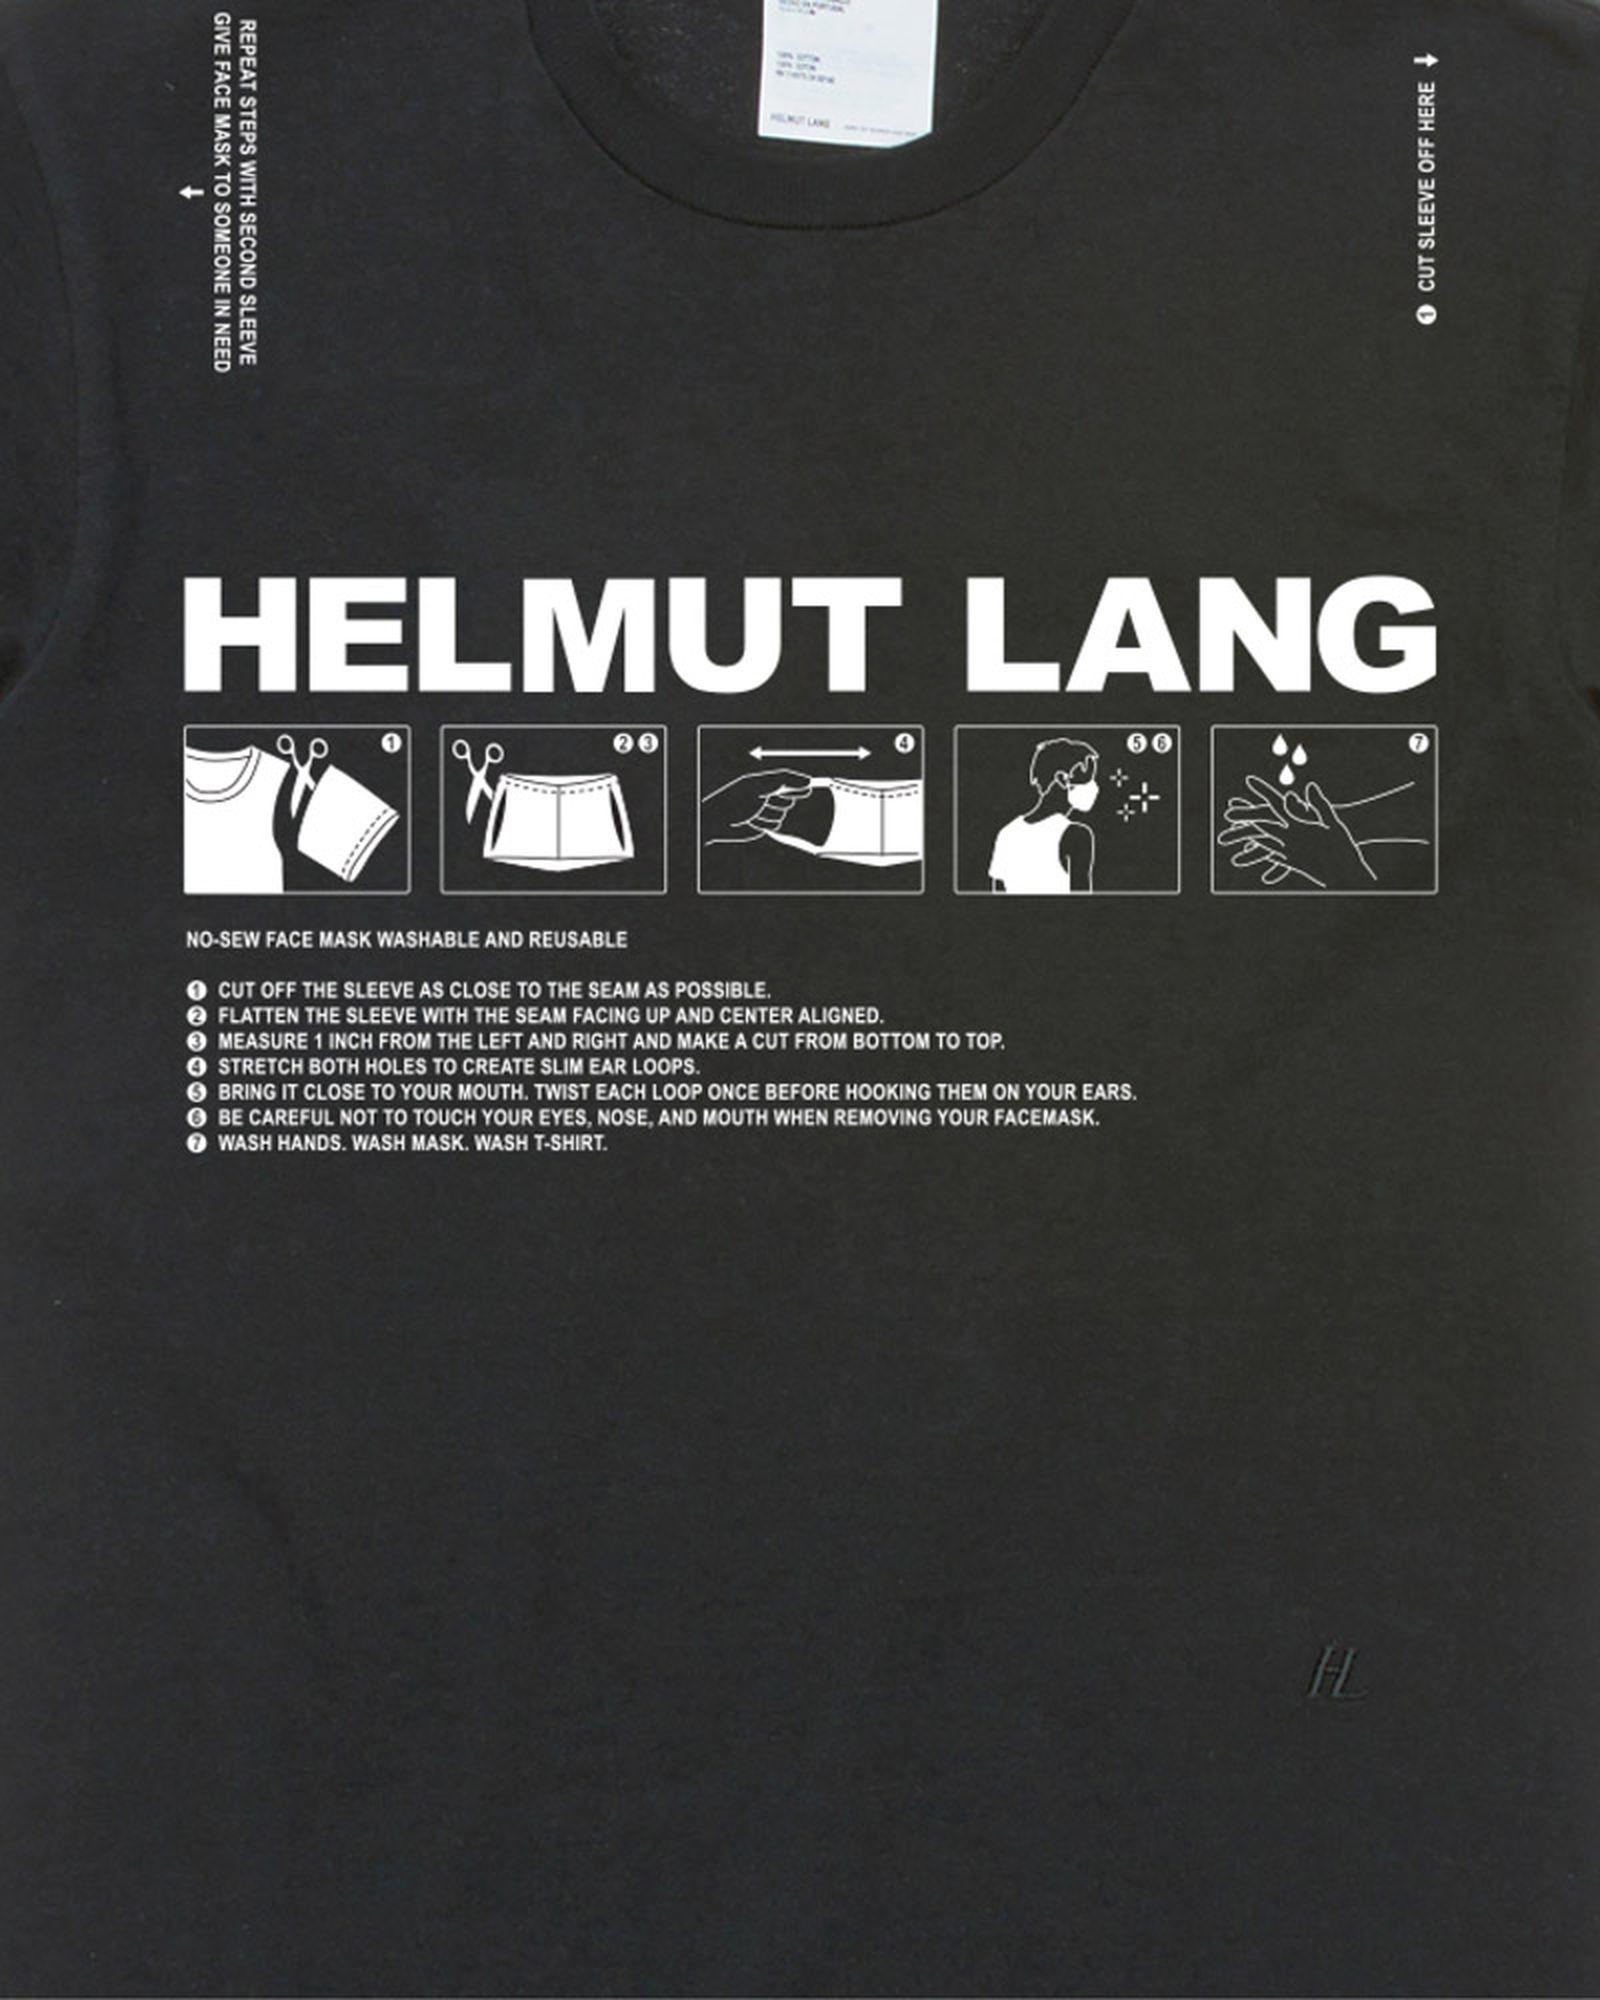 12helmut-lang-t-shirt-design-competition